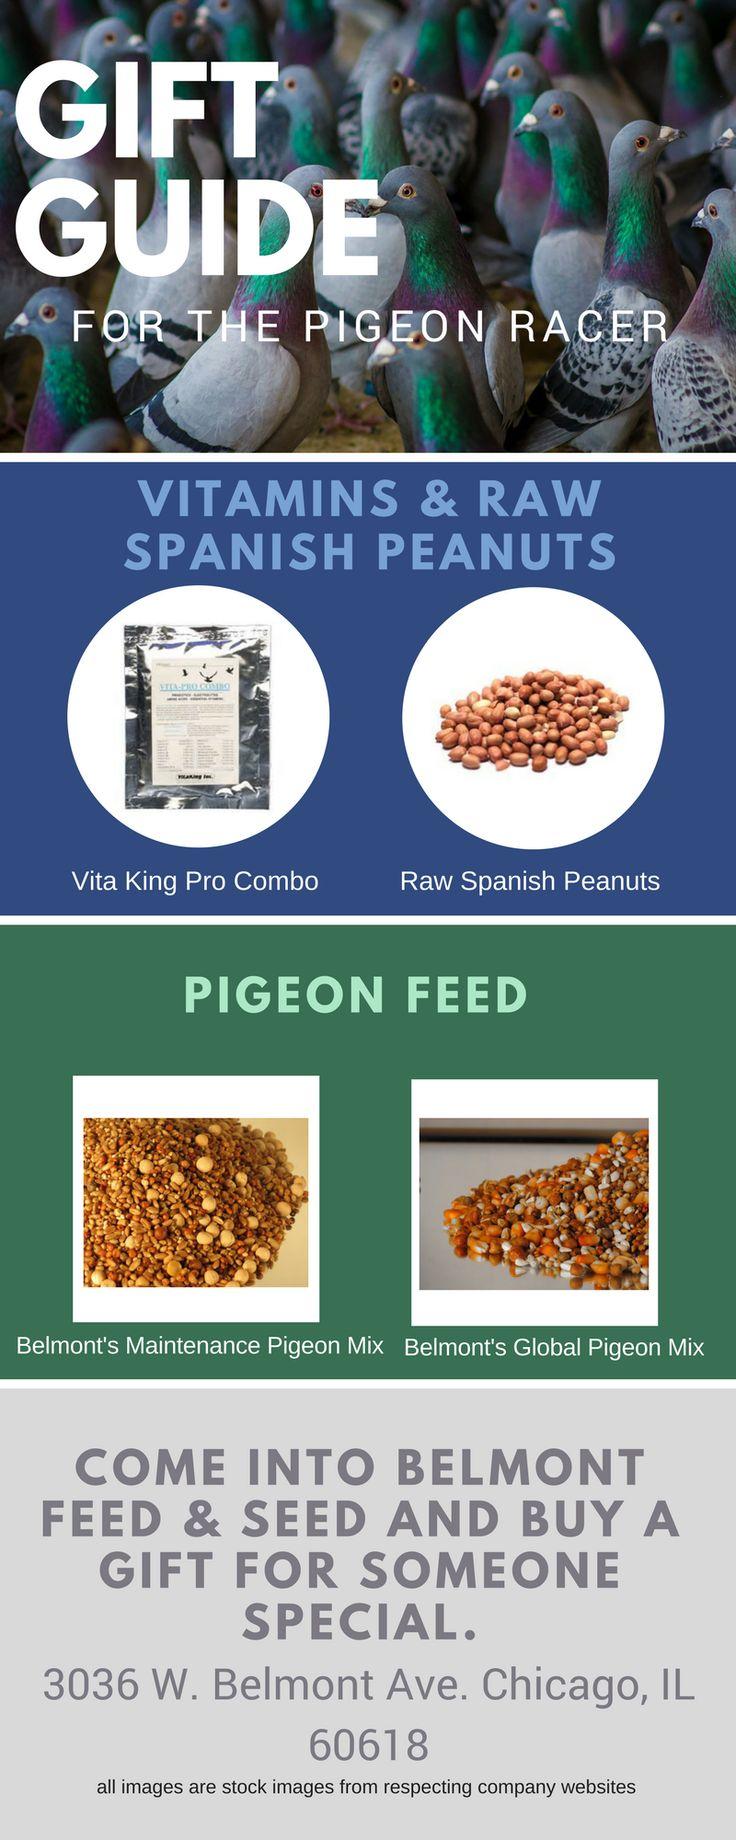 Pigeon Feed. Raw Spanish Peanuts. King Pro Combo. Pigeon Vitamins. Pigeon Supplements. Pigeon Medications. Racing Pigeon feed.